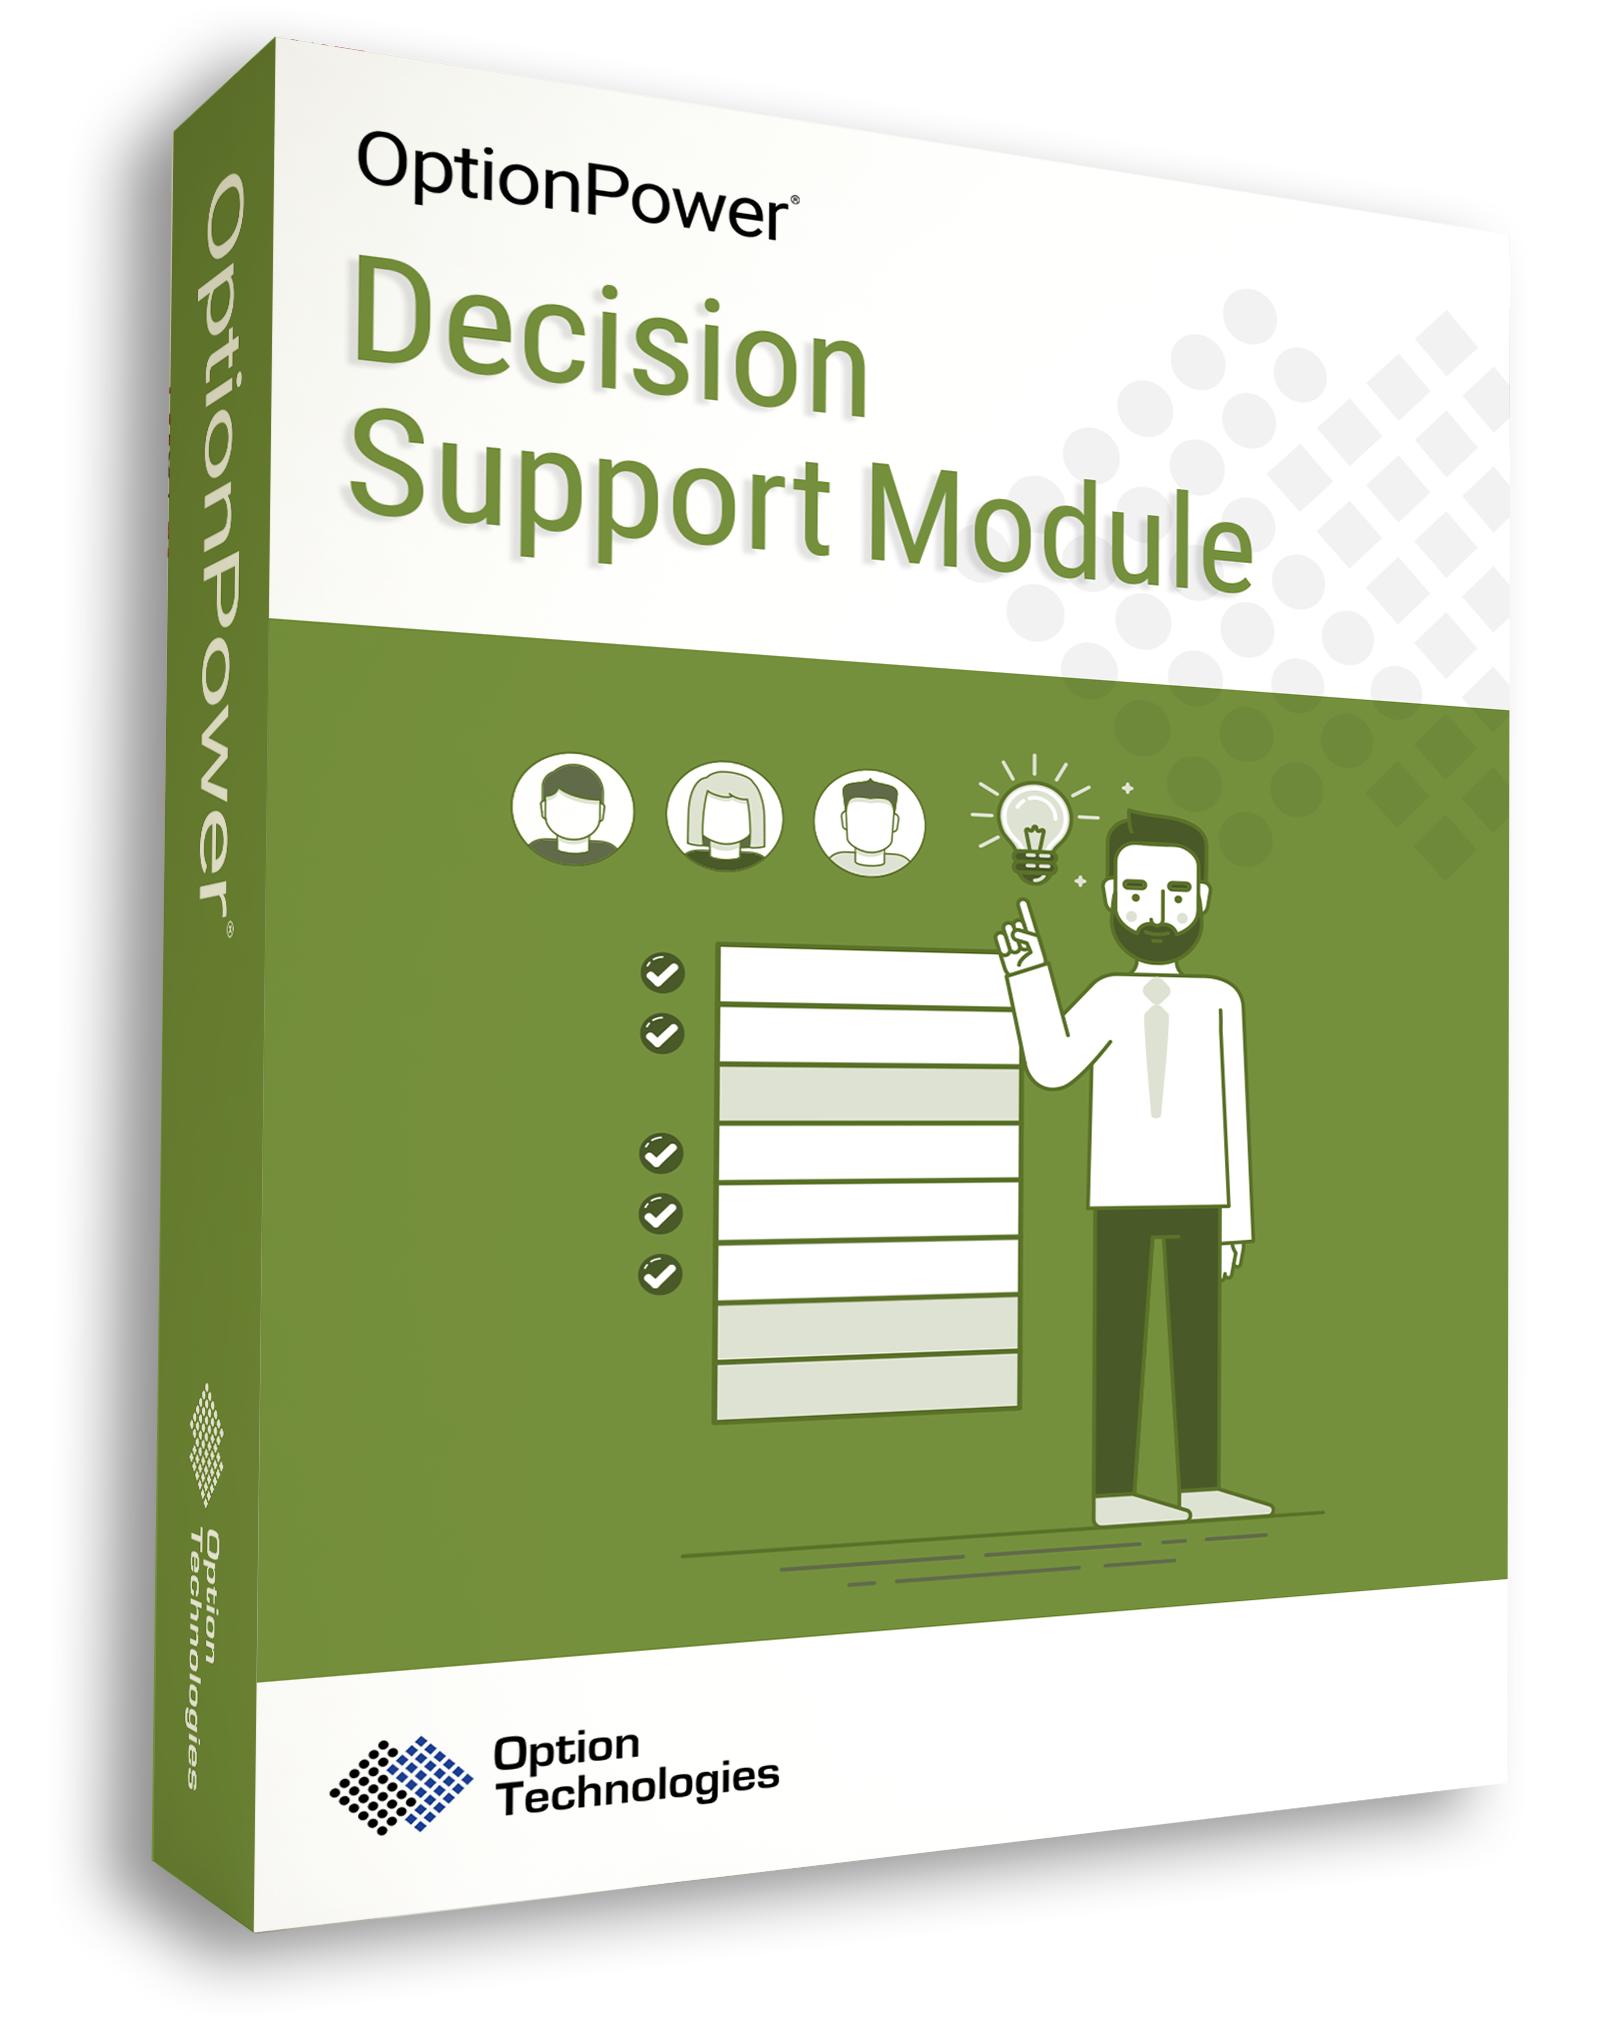 OptionPower-BoxArt-Decision-Support